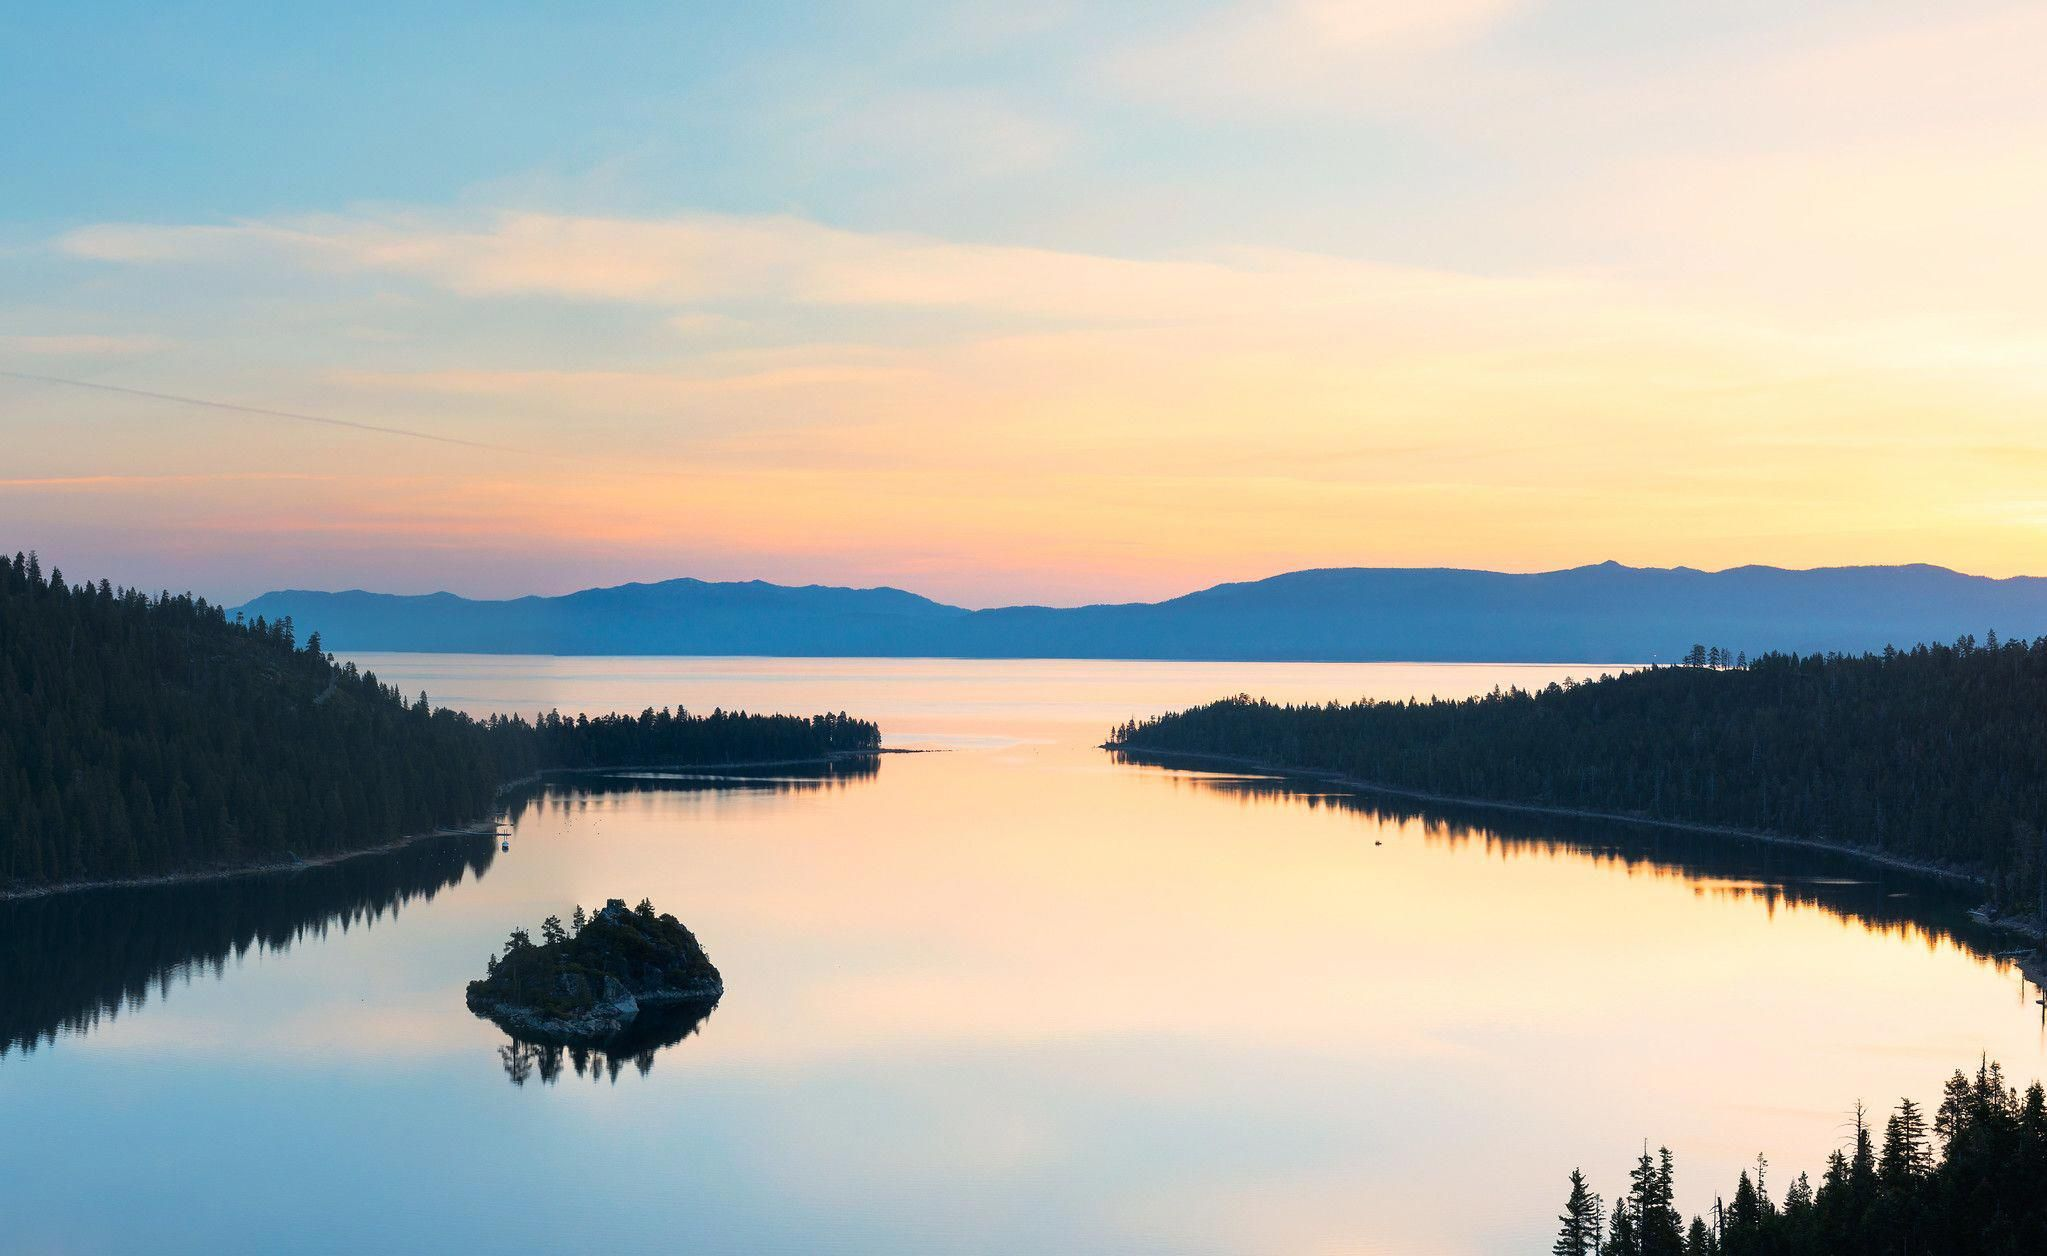 A Breathtakingg Sunrise At Emerald Bay Lake Tahoe California Oc 2048x1256 Music Indieartis Emerald Bay Lake Tahoe Lake Tahoe California Best Photographers